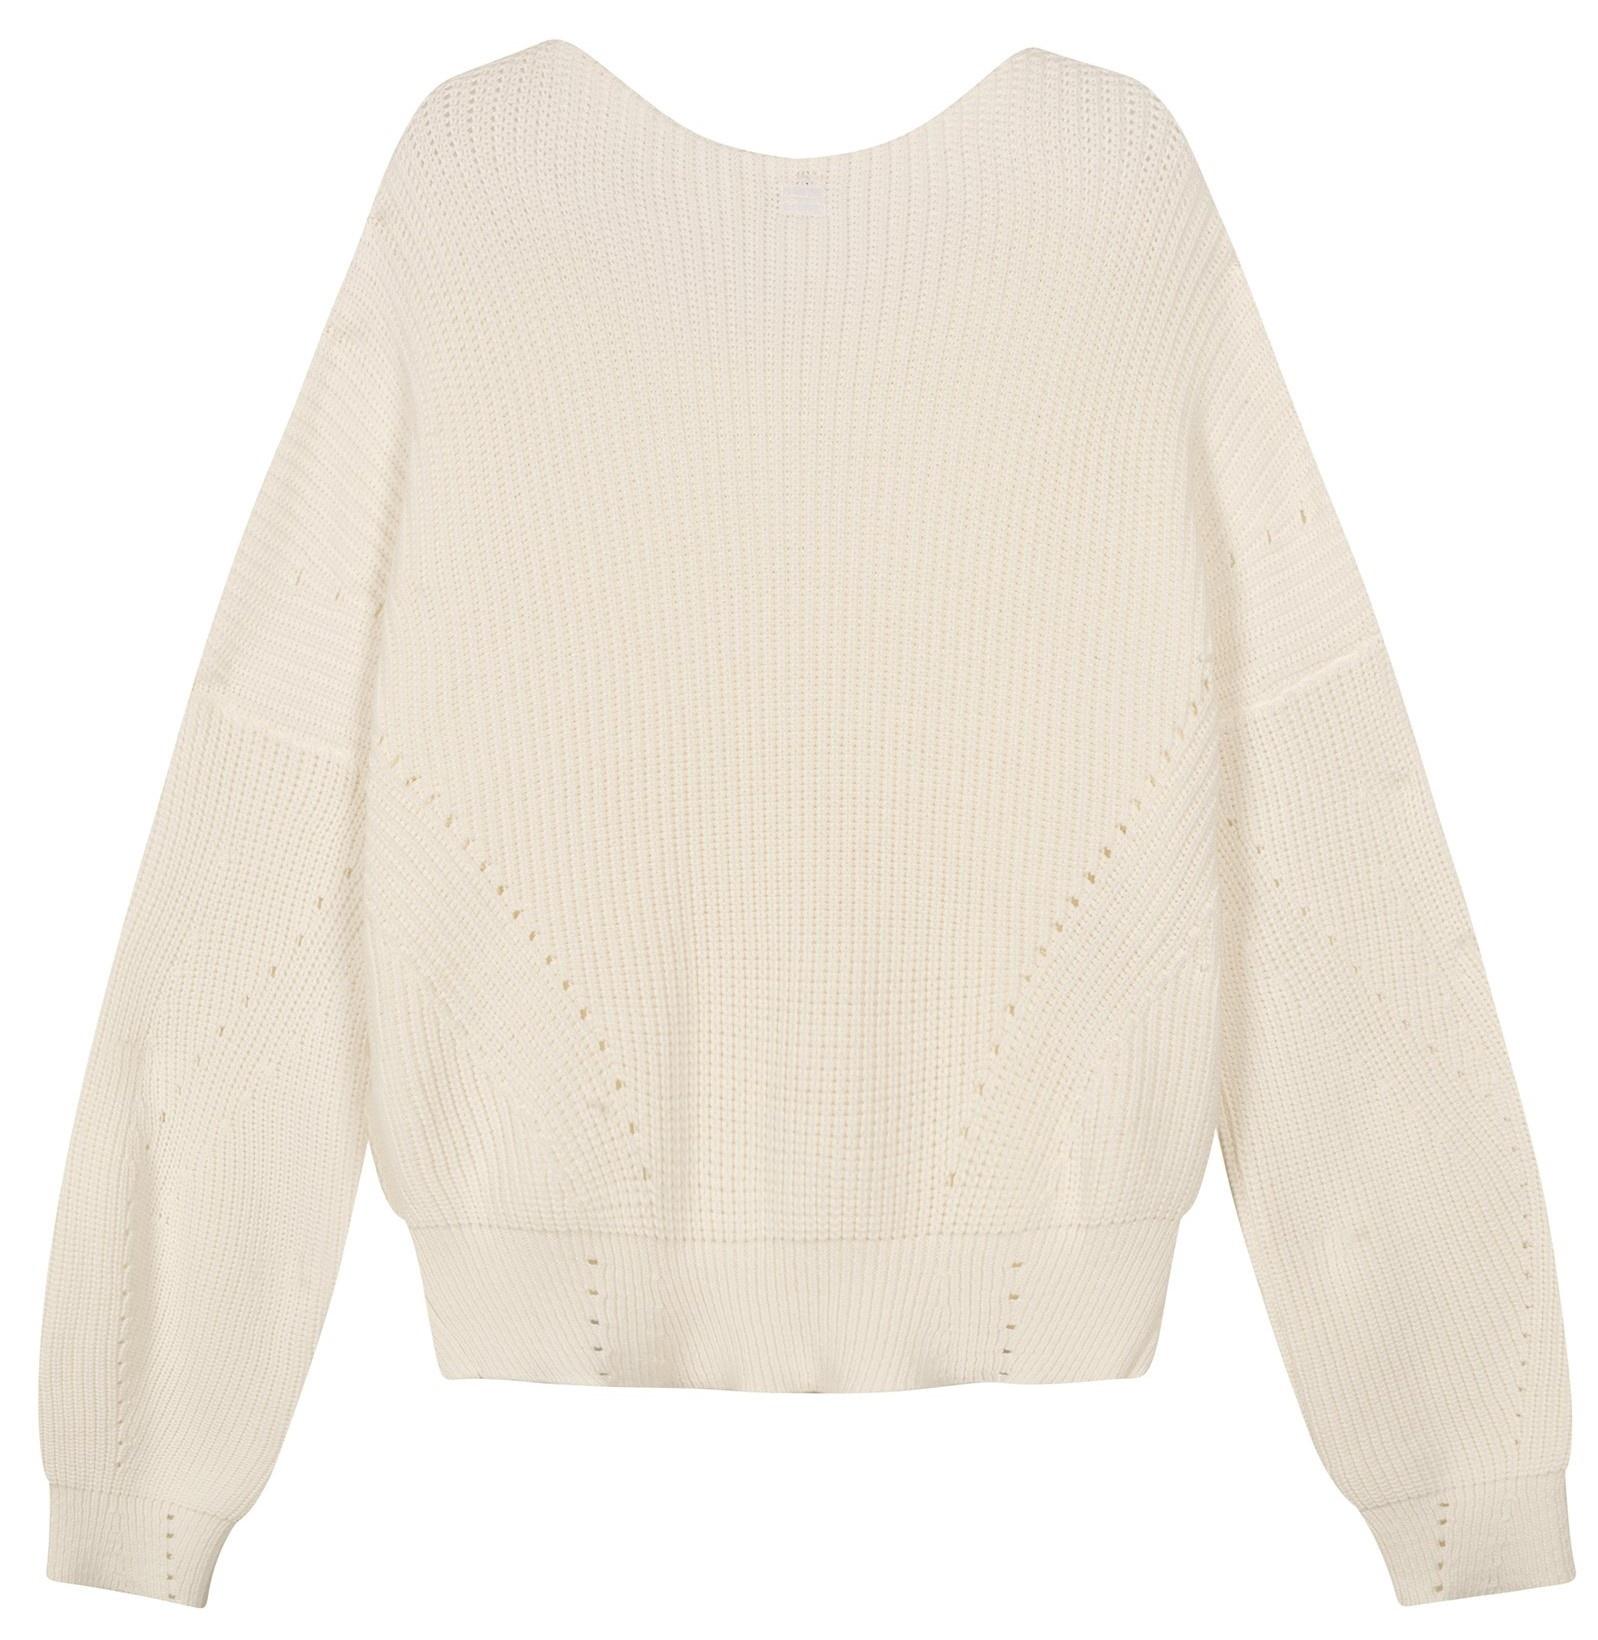 Trui sweater cotton knit white-4